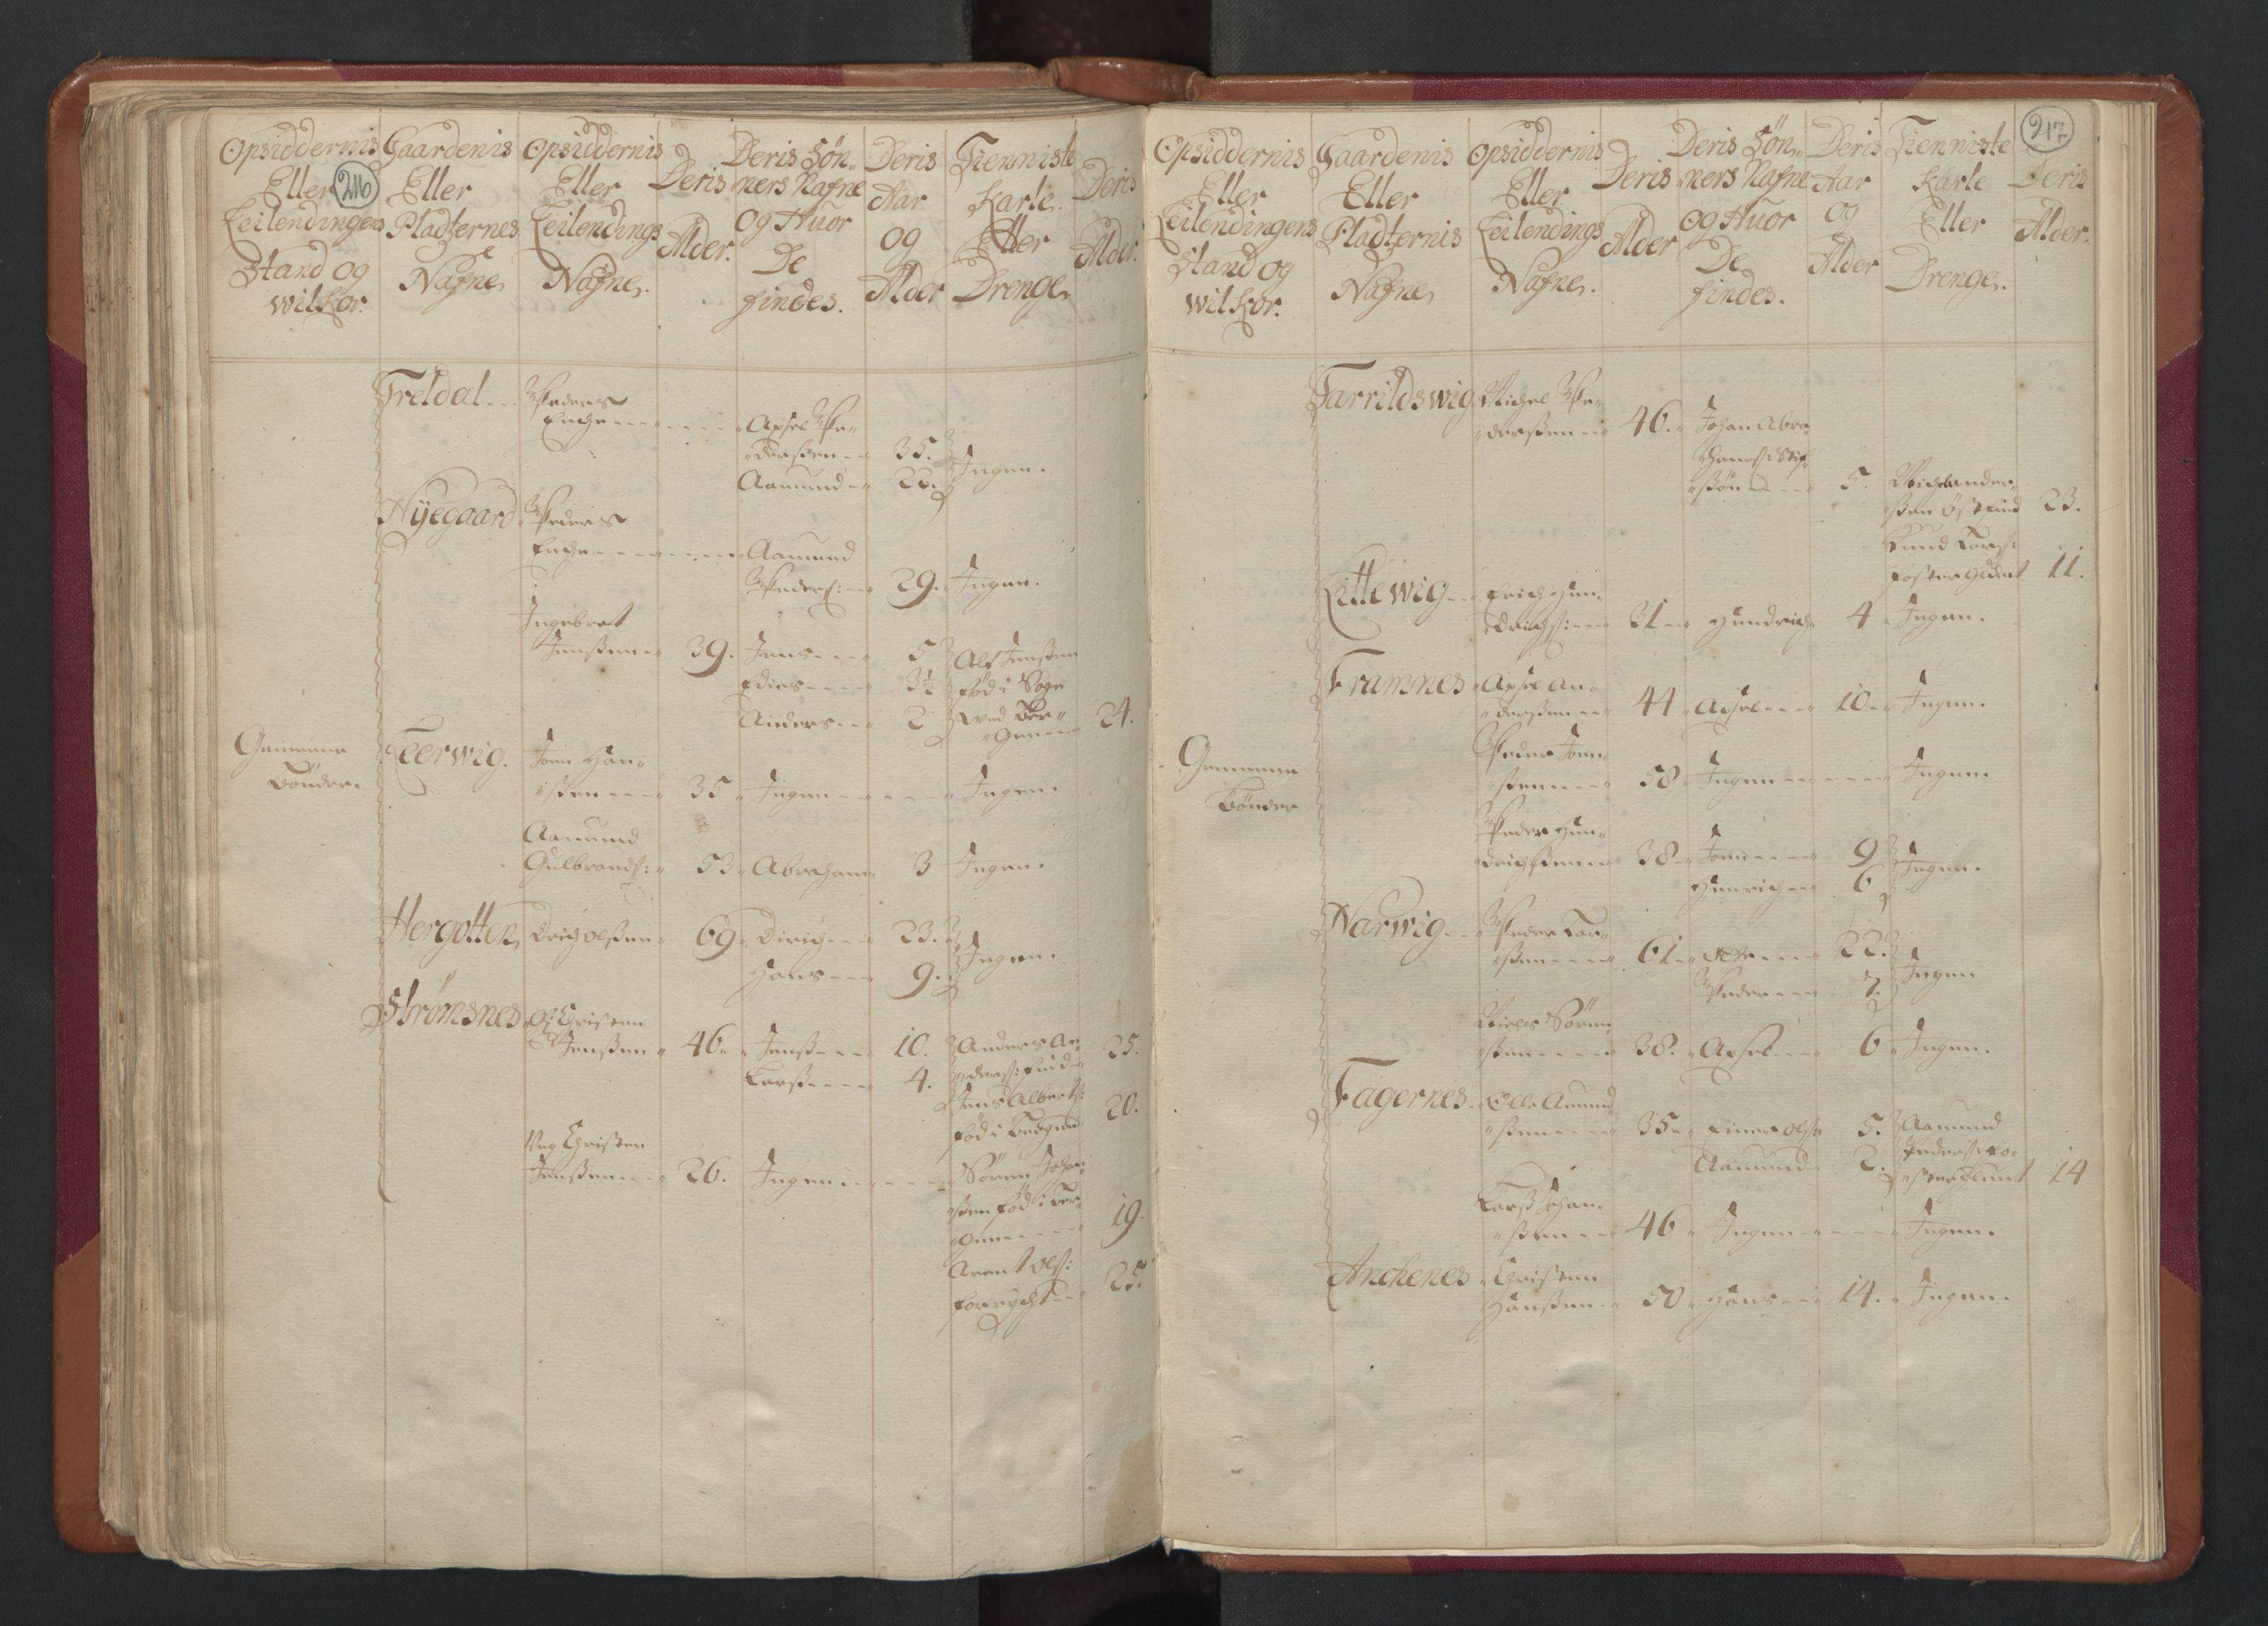 RA, Manntallet 1701, nr. 17: Salten fogderi, 1701, s. 216-217